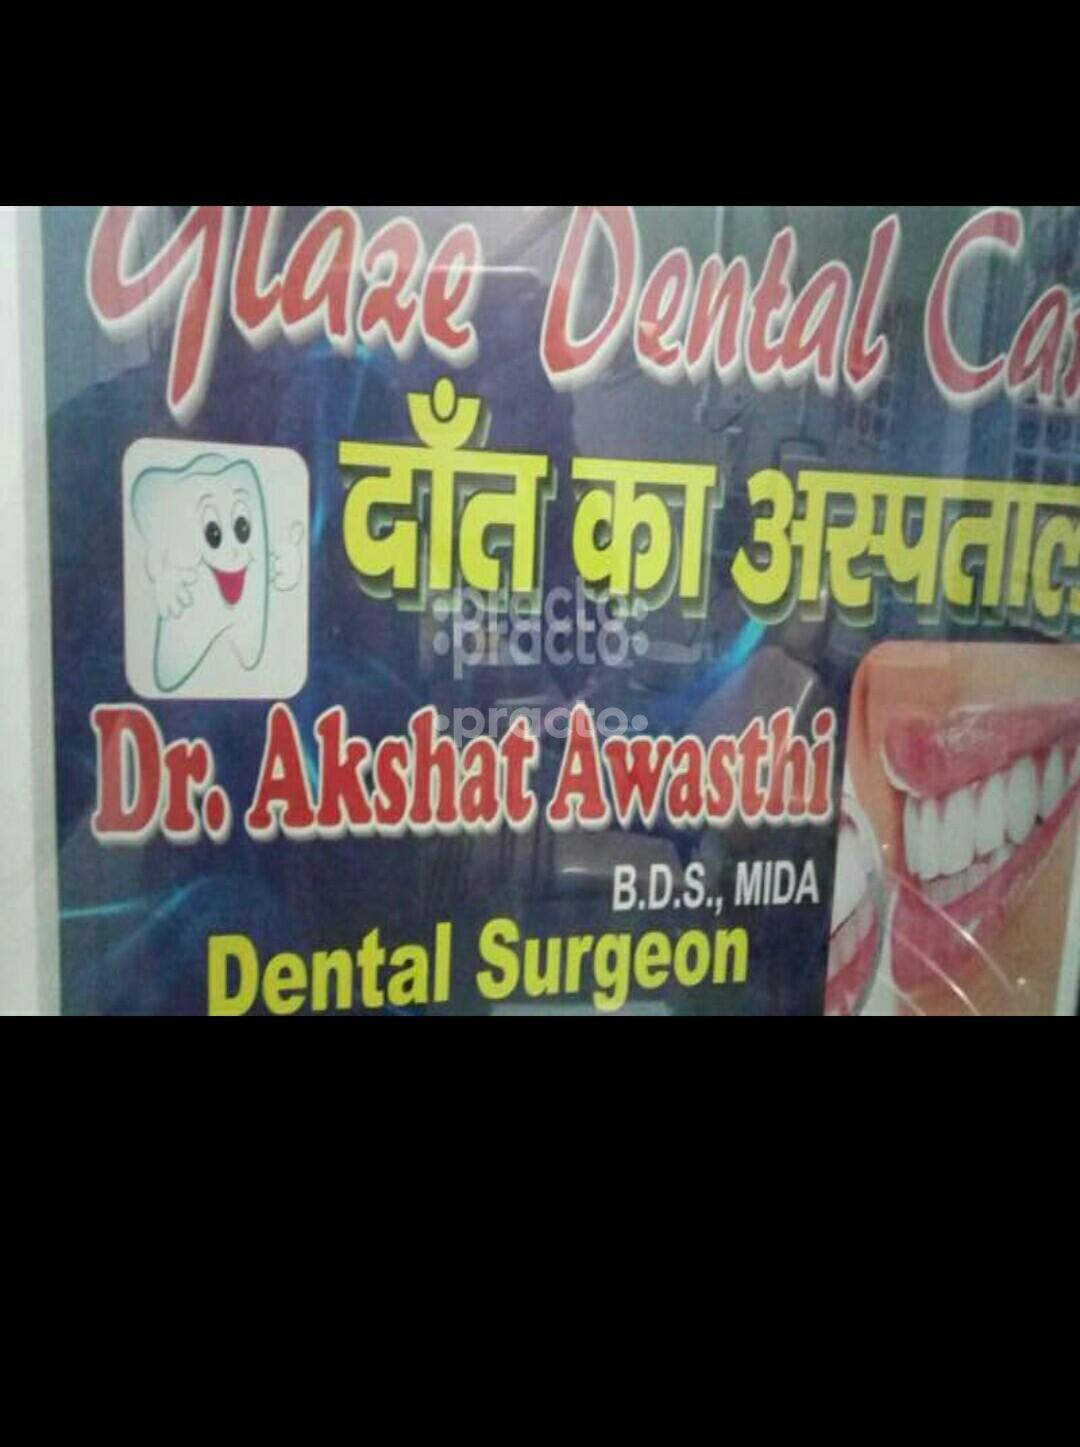 Glaze Dental Care